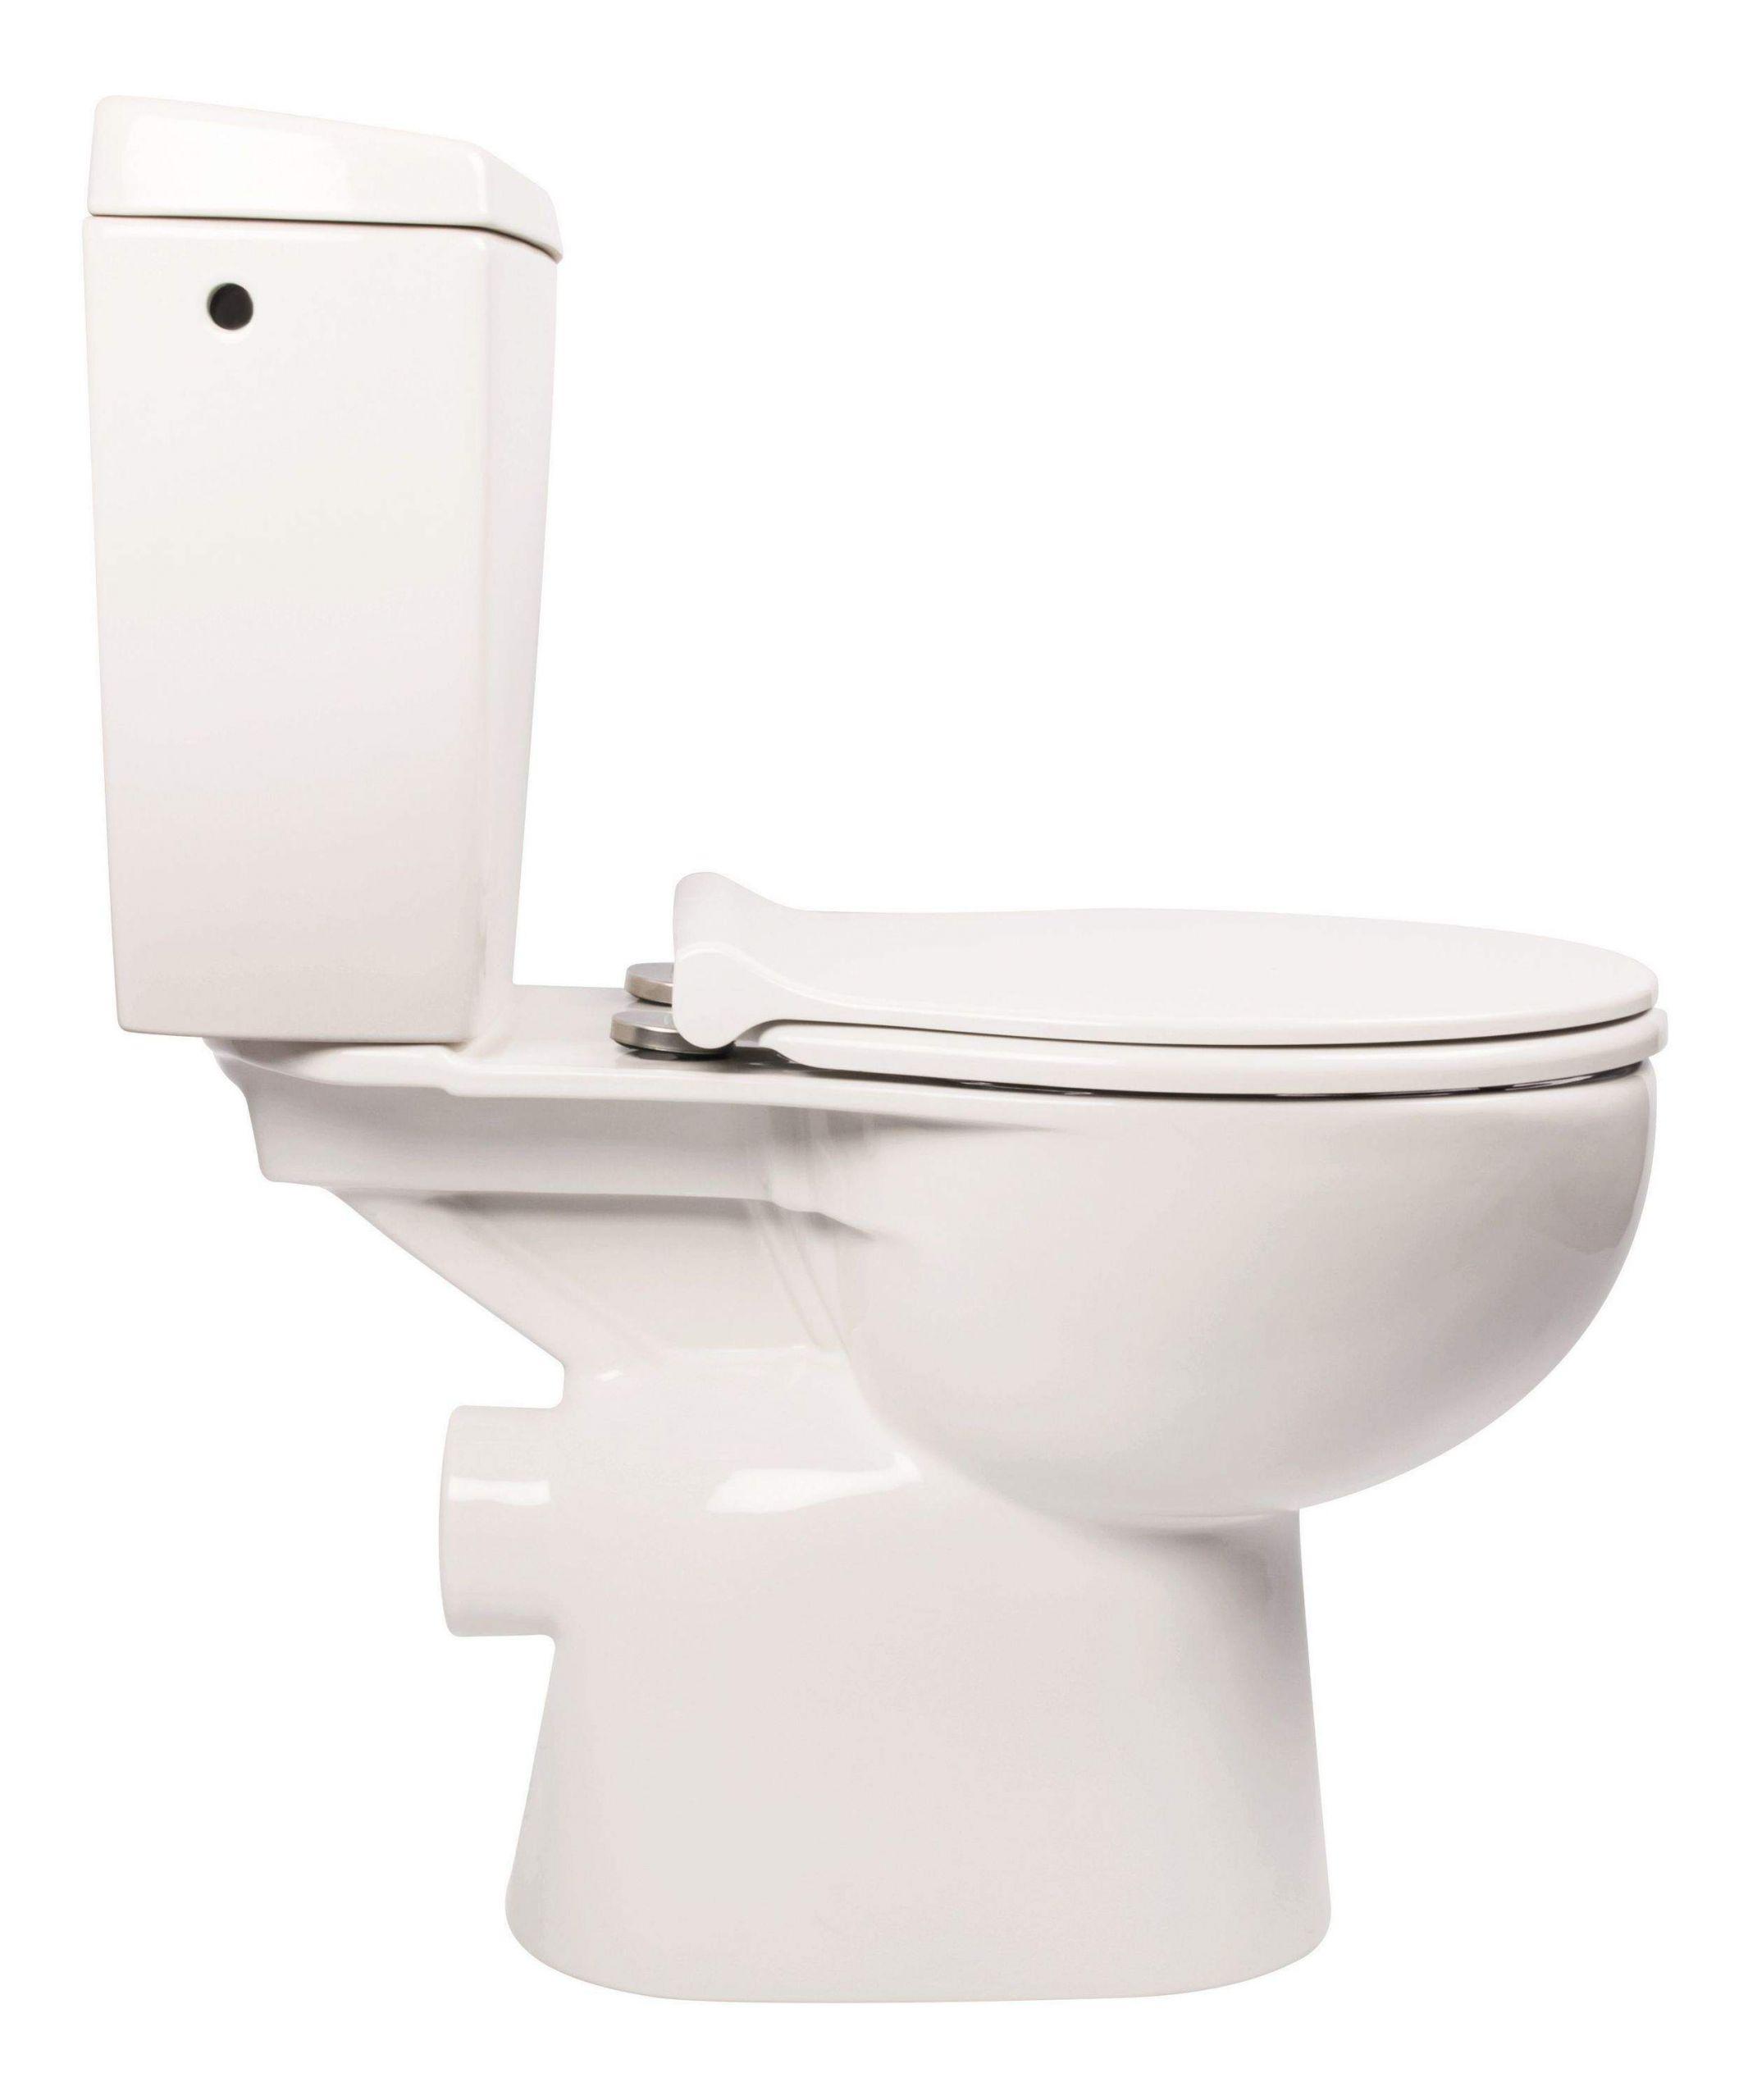 09AB3133 09 Toilette Spuelrandlos Stand WC Spue 1ipowBcdnPyuUi